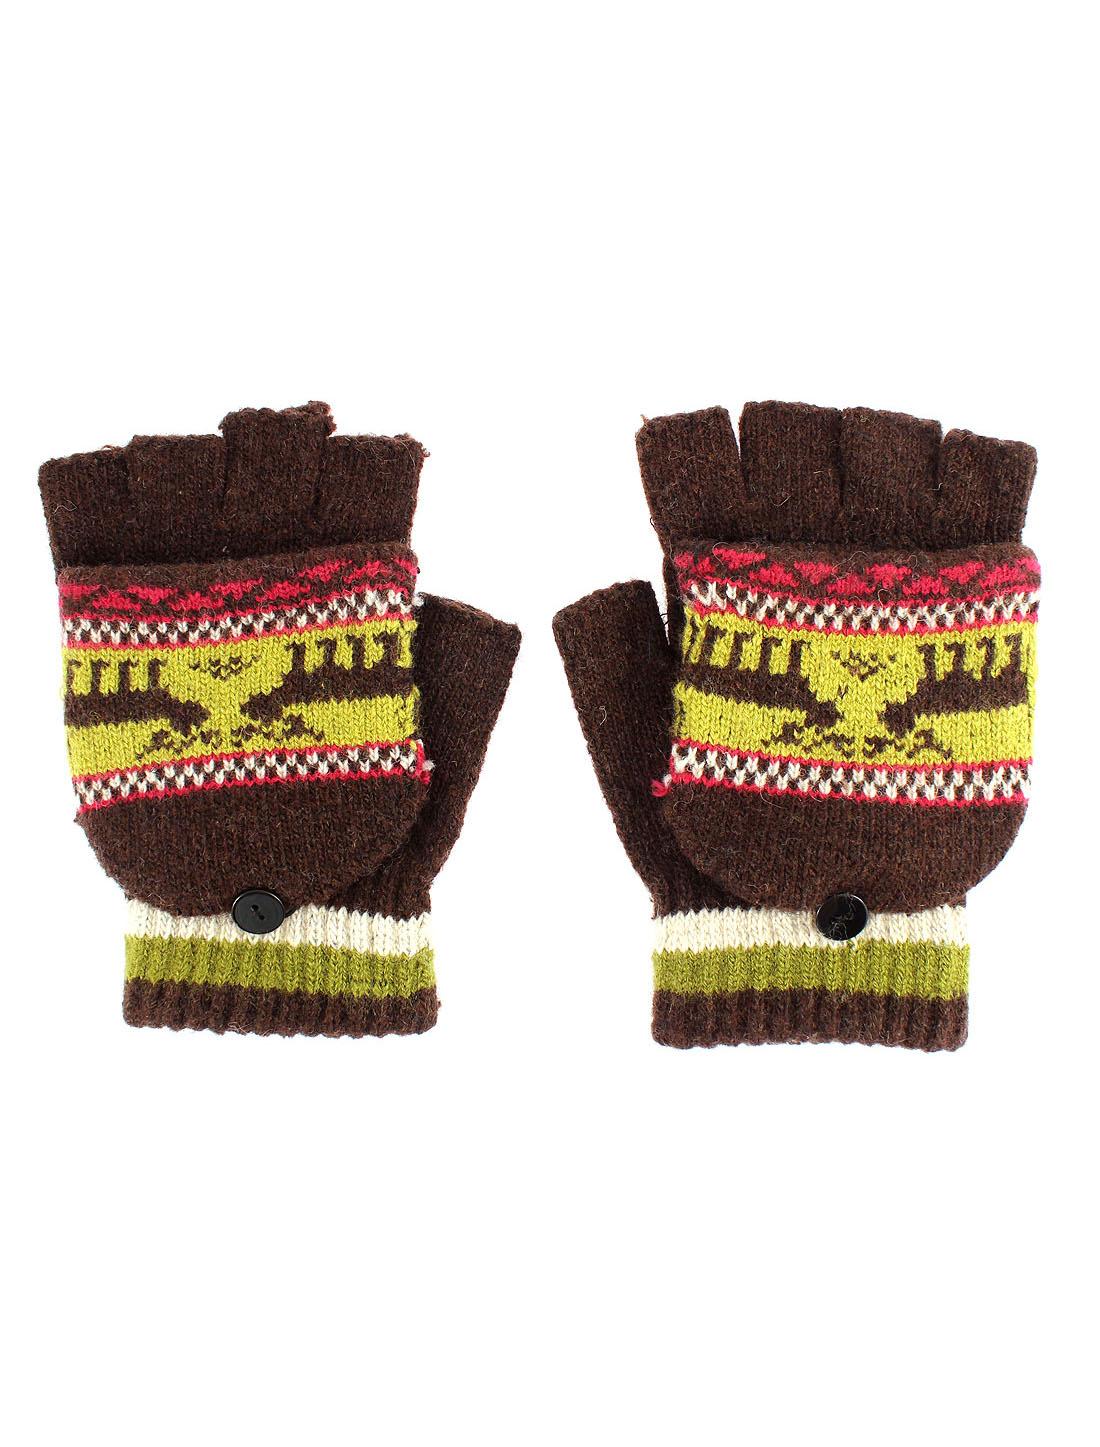 Unisex Deer Pattern Flip Convertible Half-finger Knitted Gloves Brown Pair